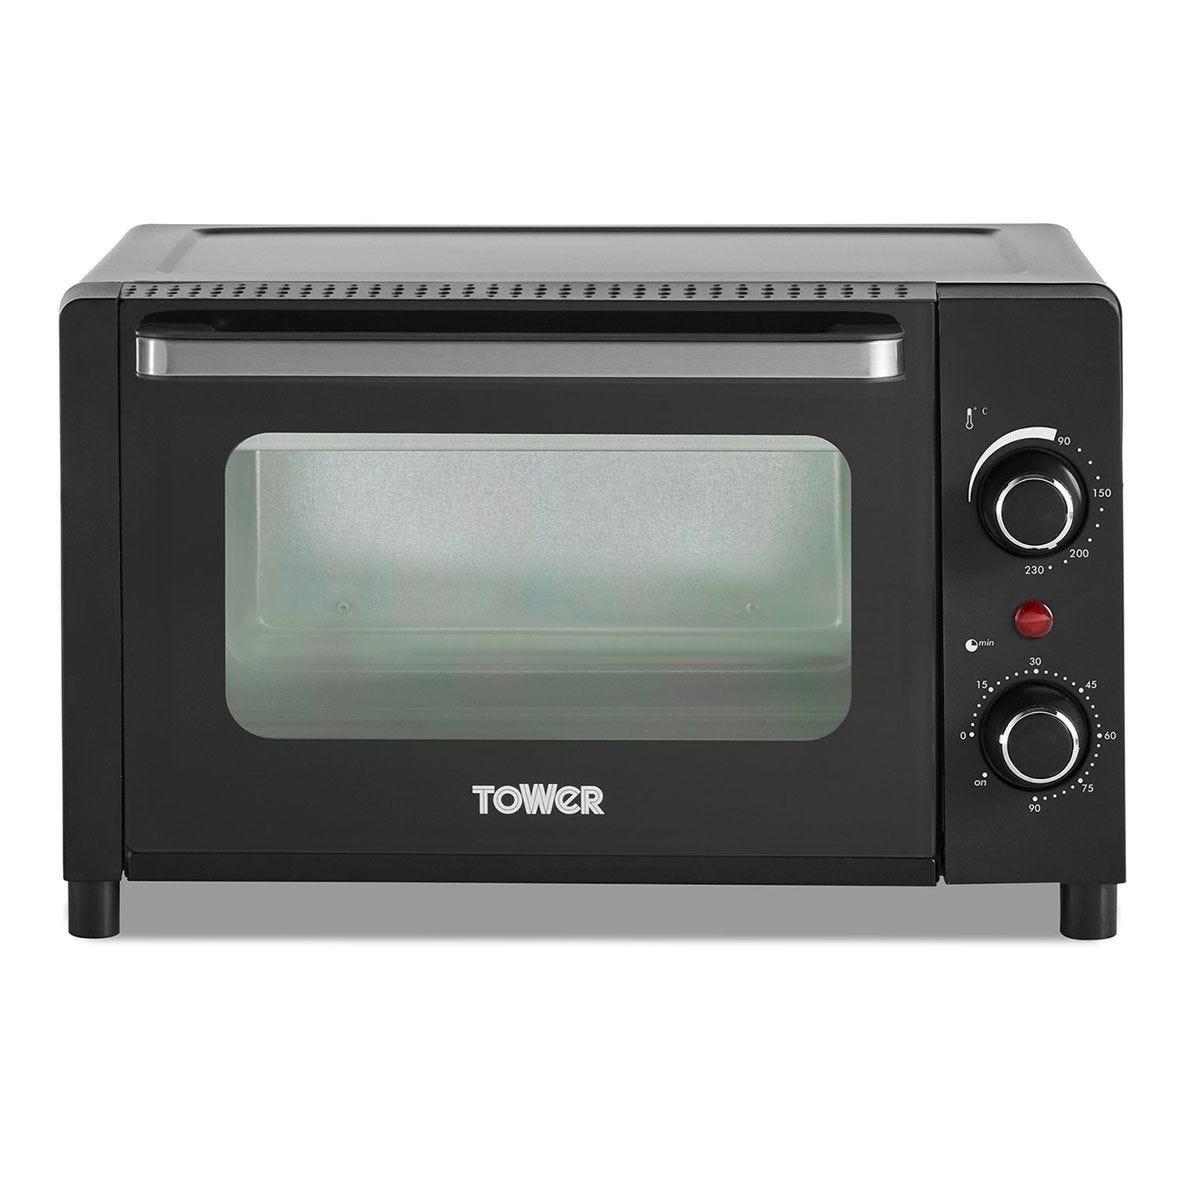 Tower 12L Mini Oven - Black